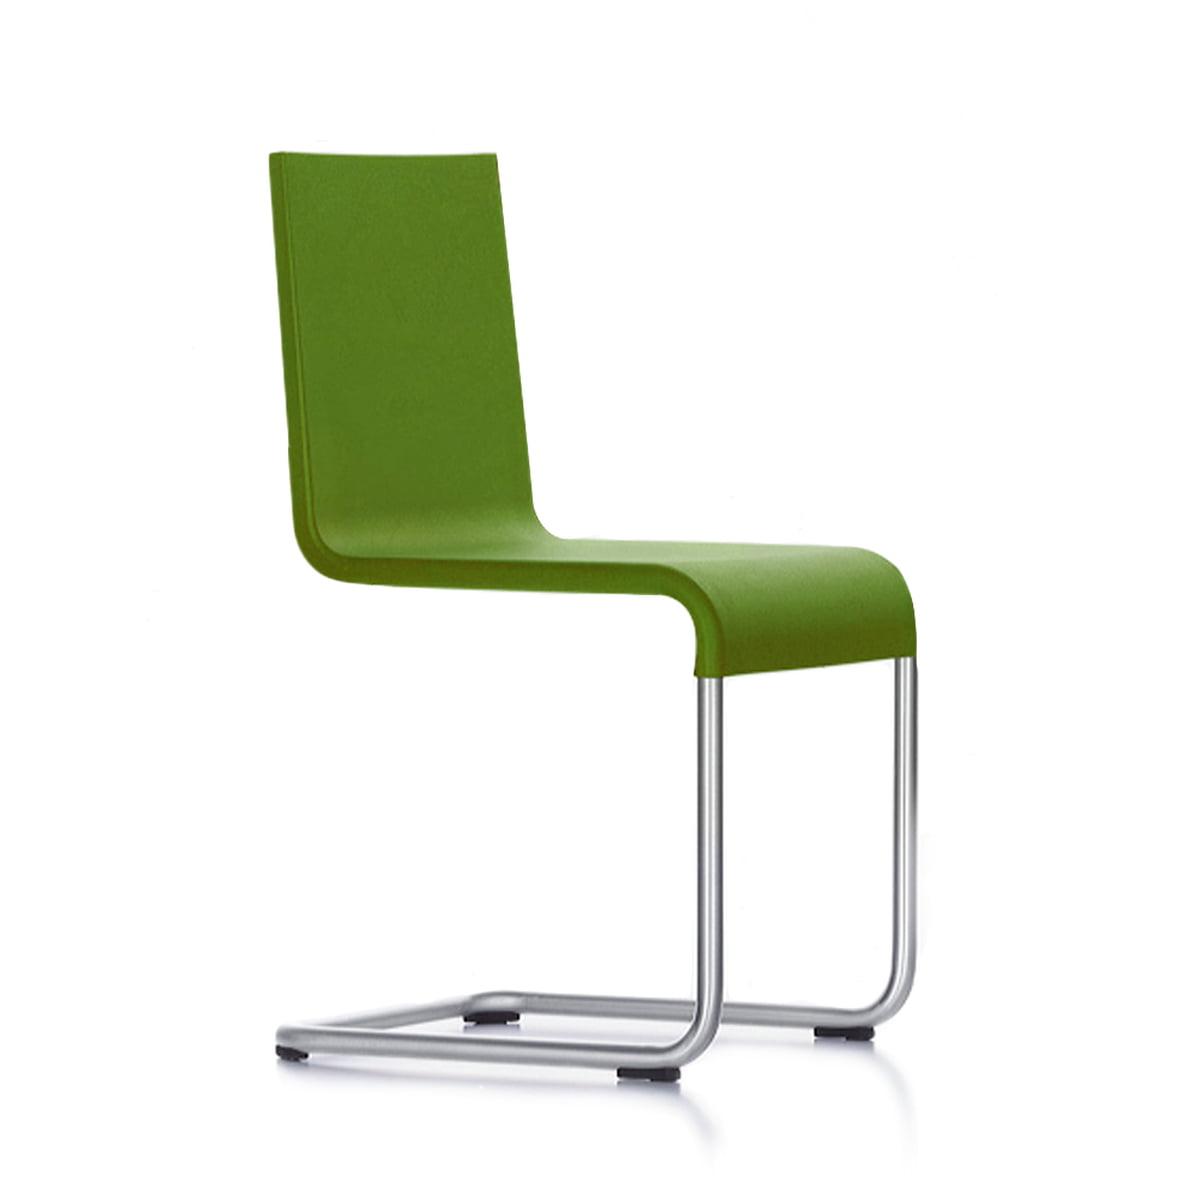 Stuhl zeichnung  05 Stuhl | Vitra | connox.at